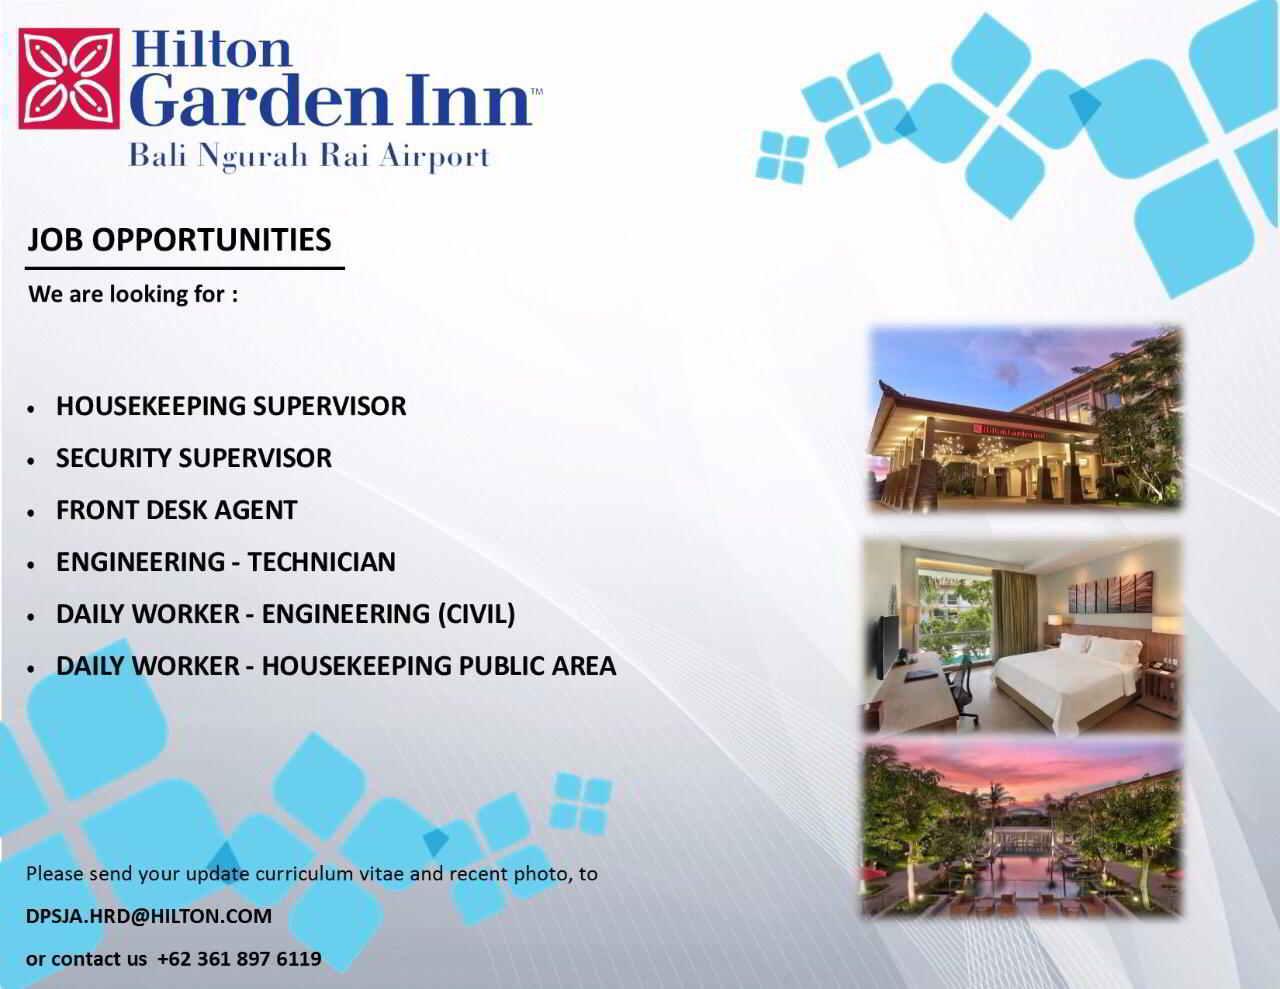 Hilton Garden Inn Bali Jobs News Sept 2017 Hotelier Indonesia Jobs